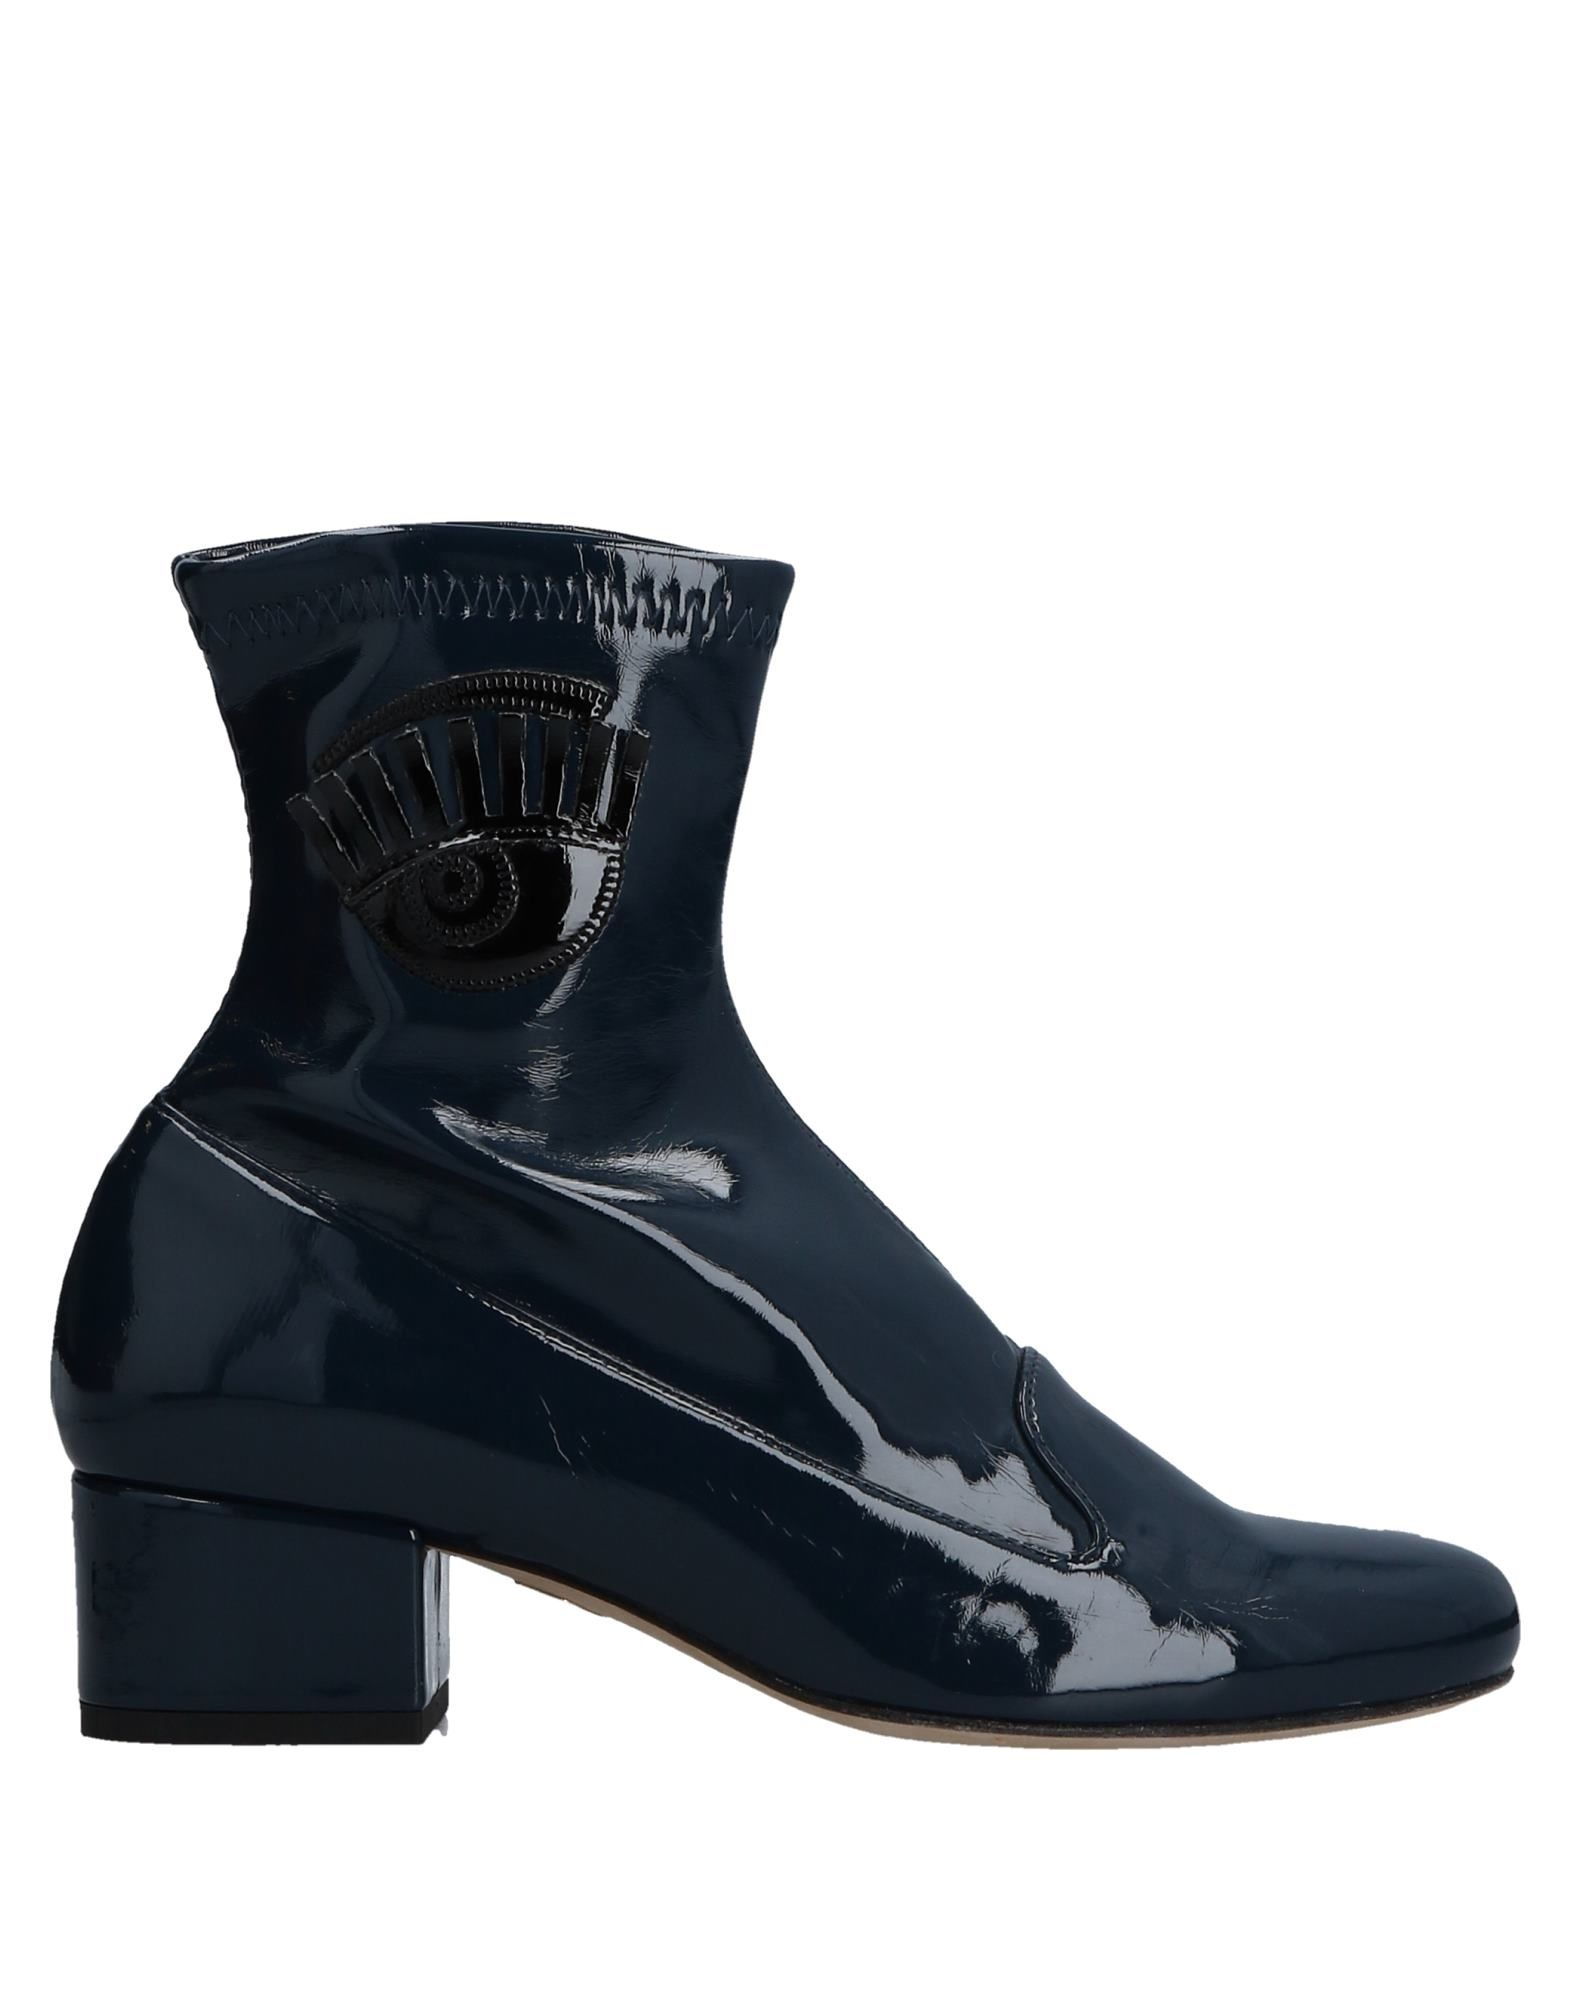 Rabatt Schuhe Chiara Ferragni Stiefelette Damen  11520152CO